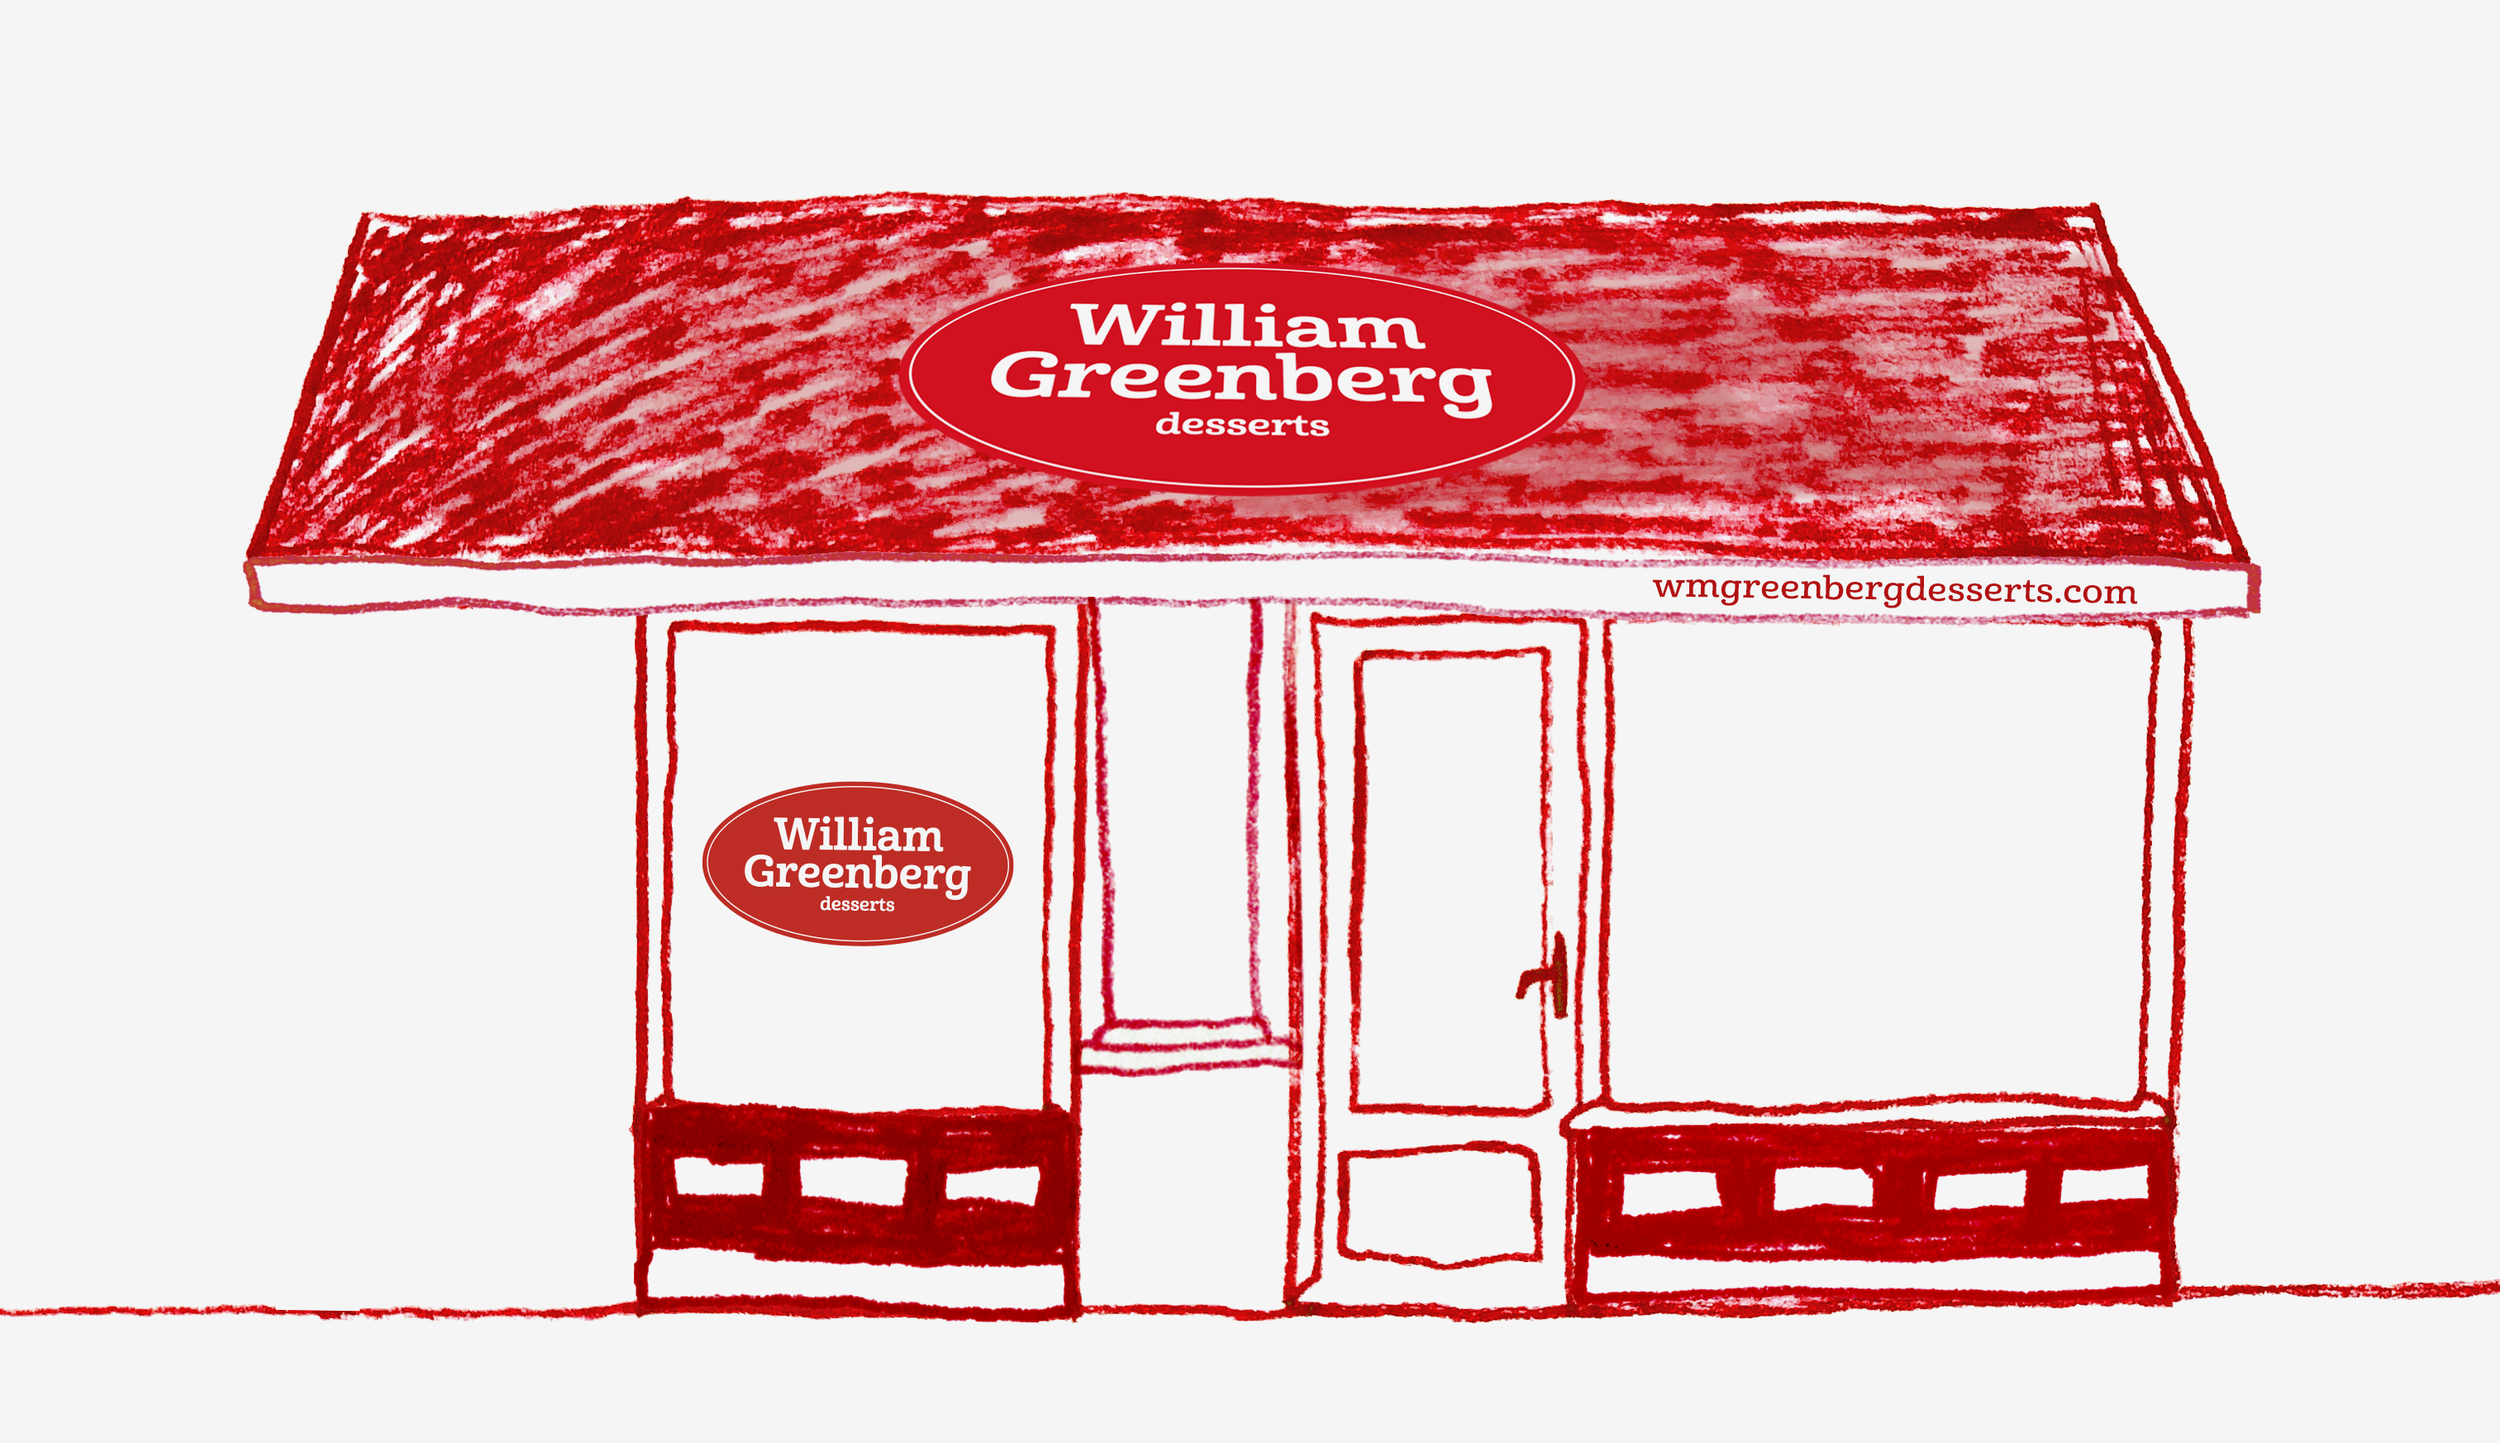 William-Greenberg-NYC-Upper-East-Side